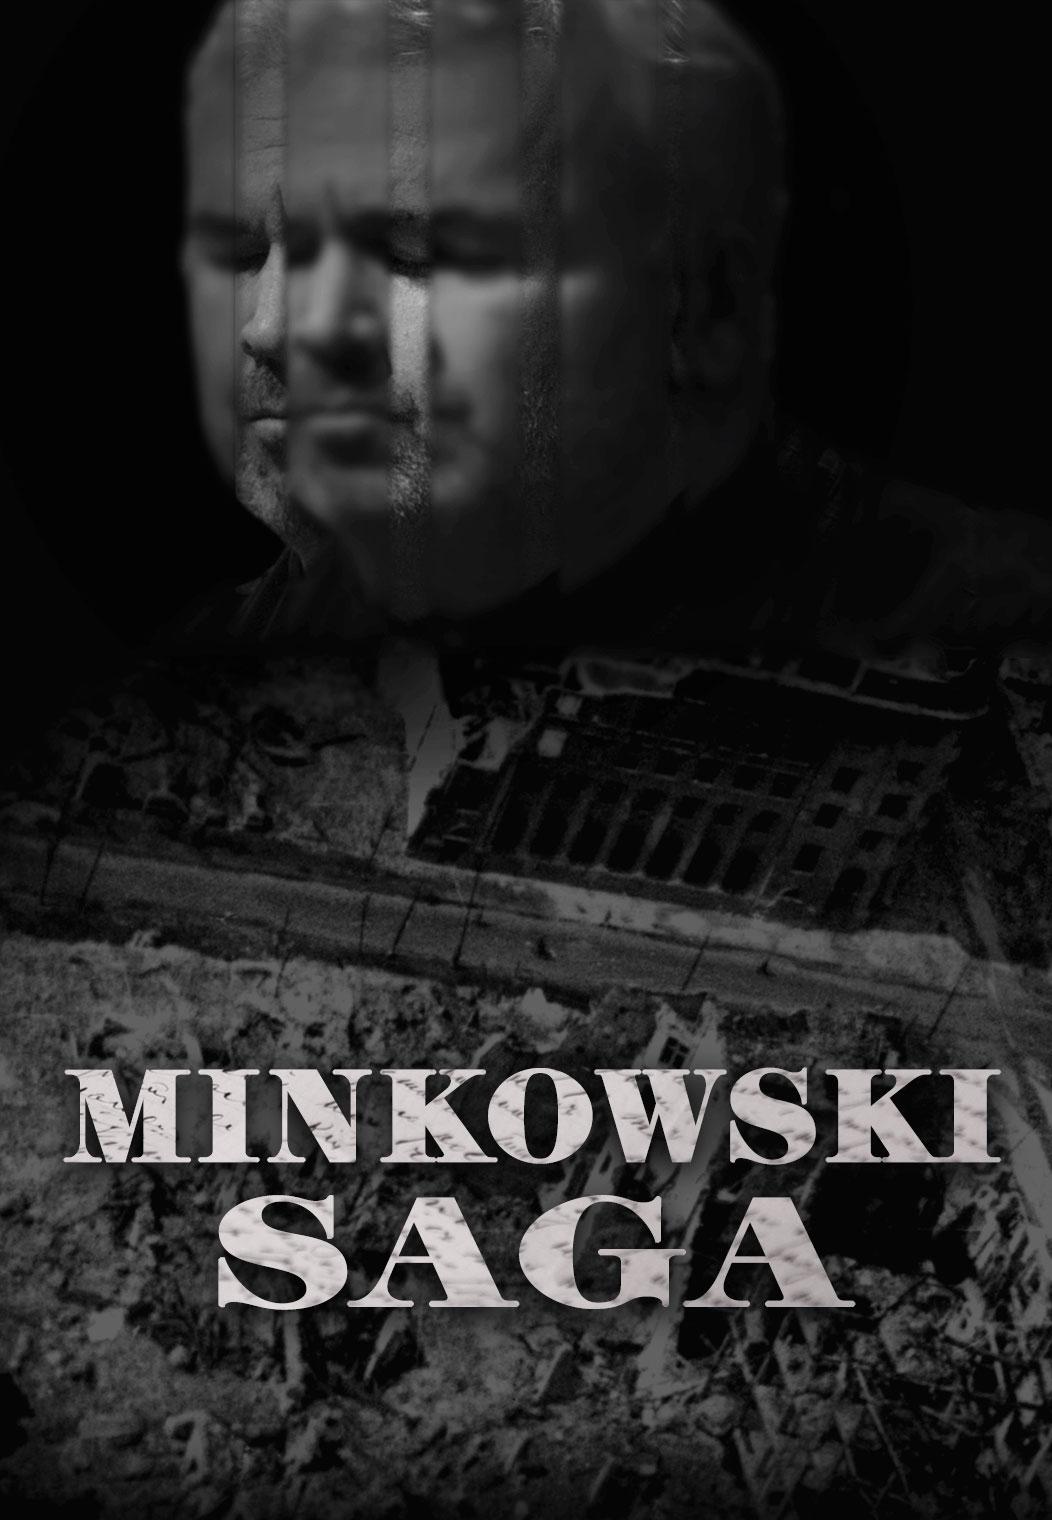 Minkowski Saga